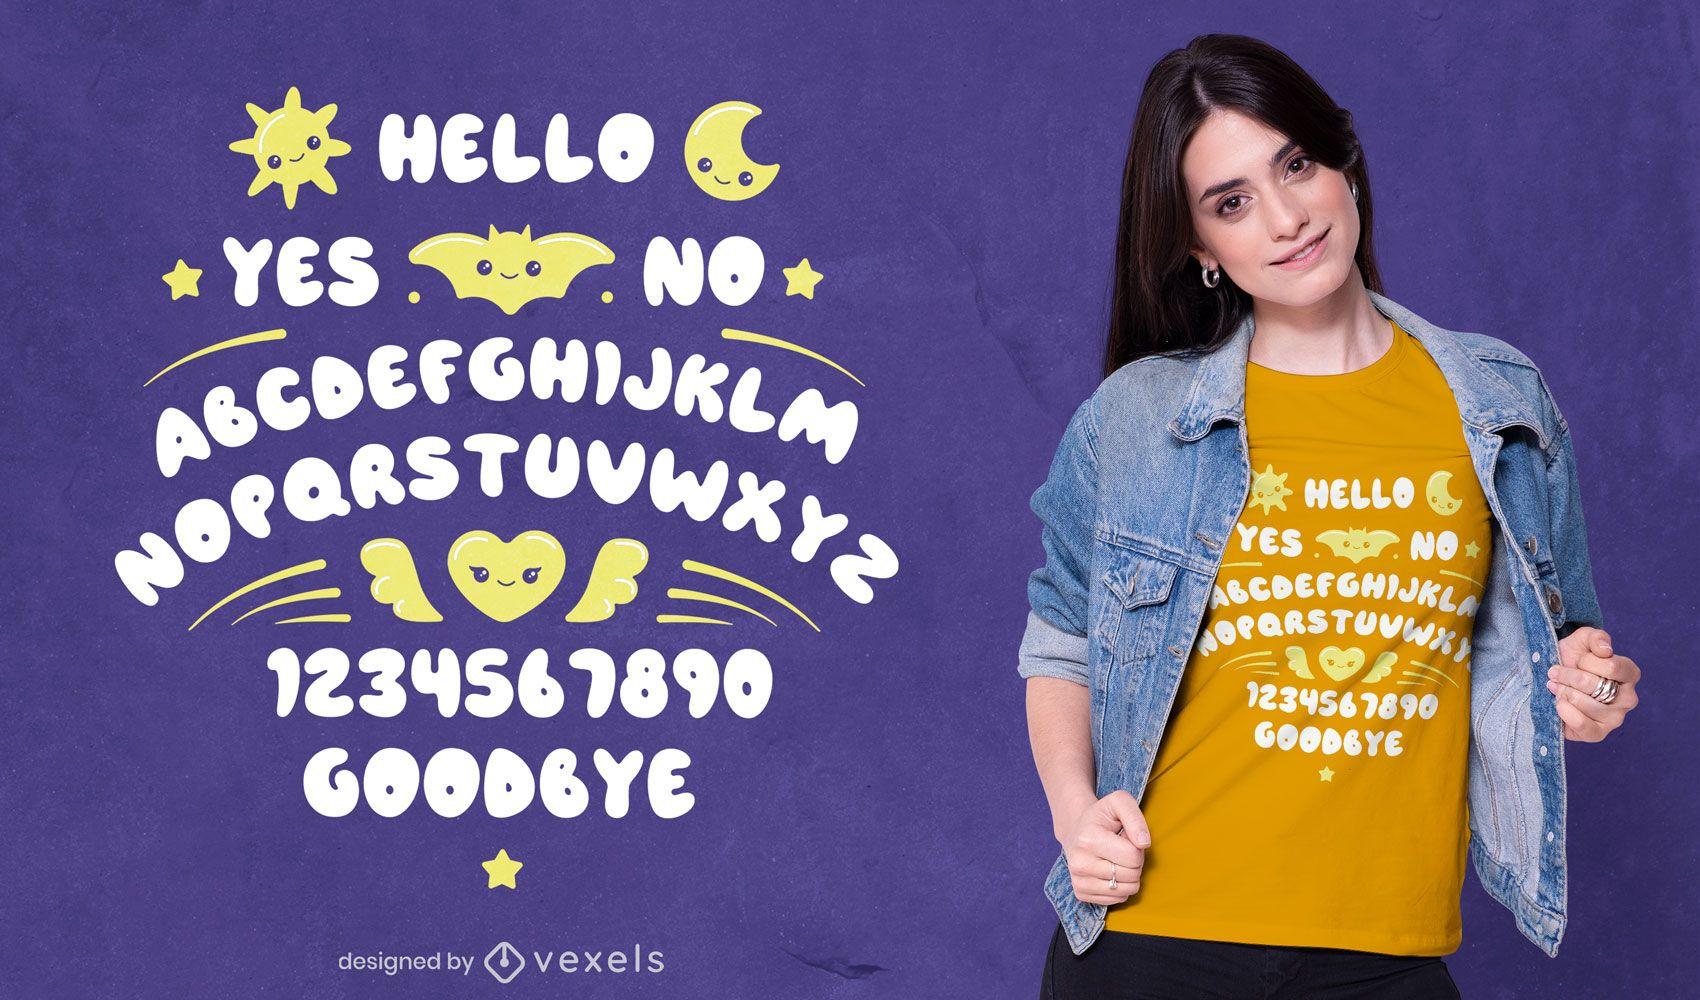 Cute ouija board t-shirt design